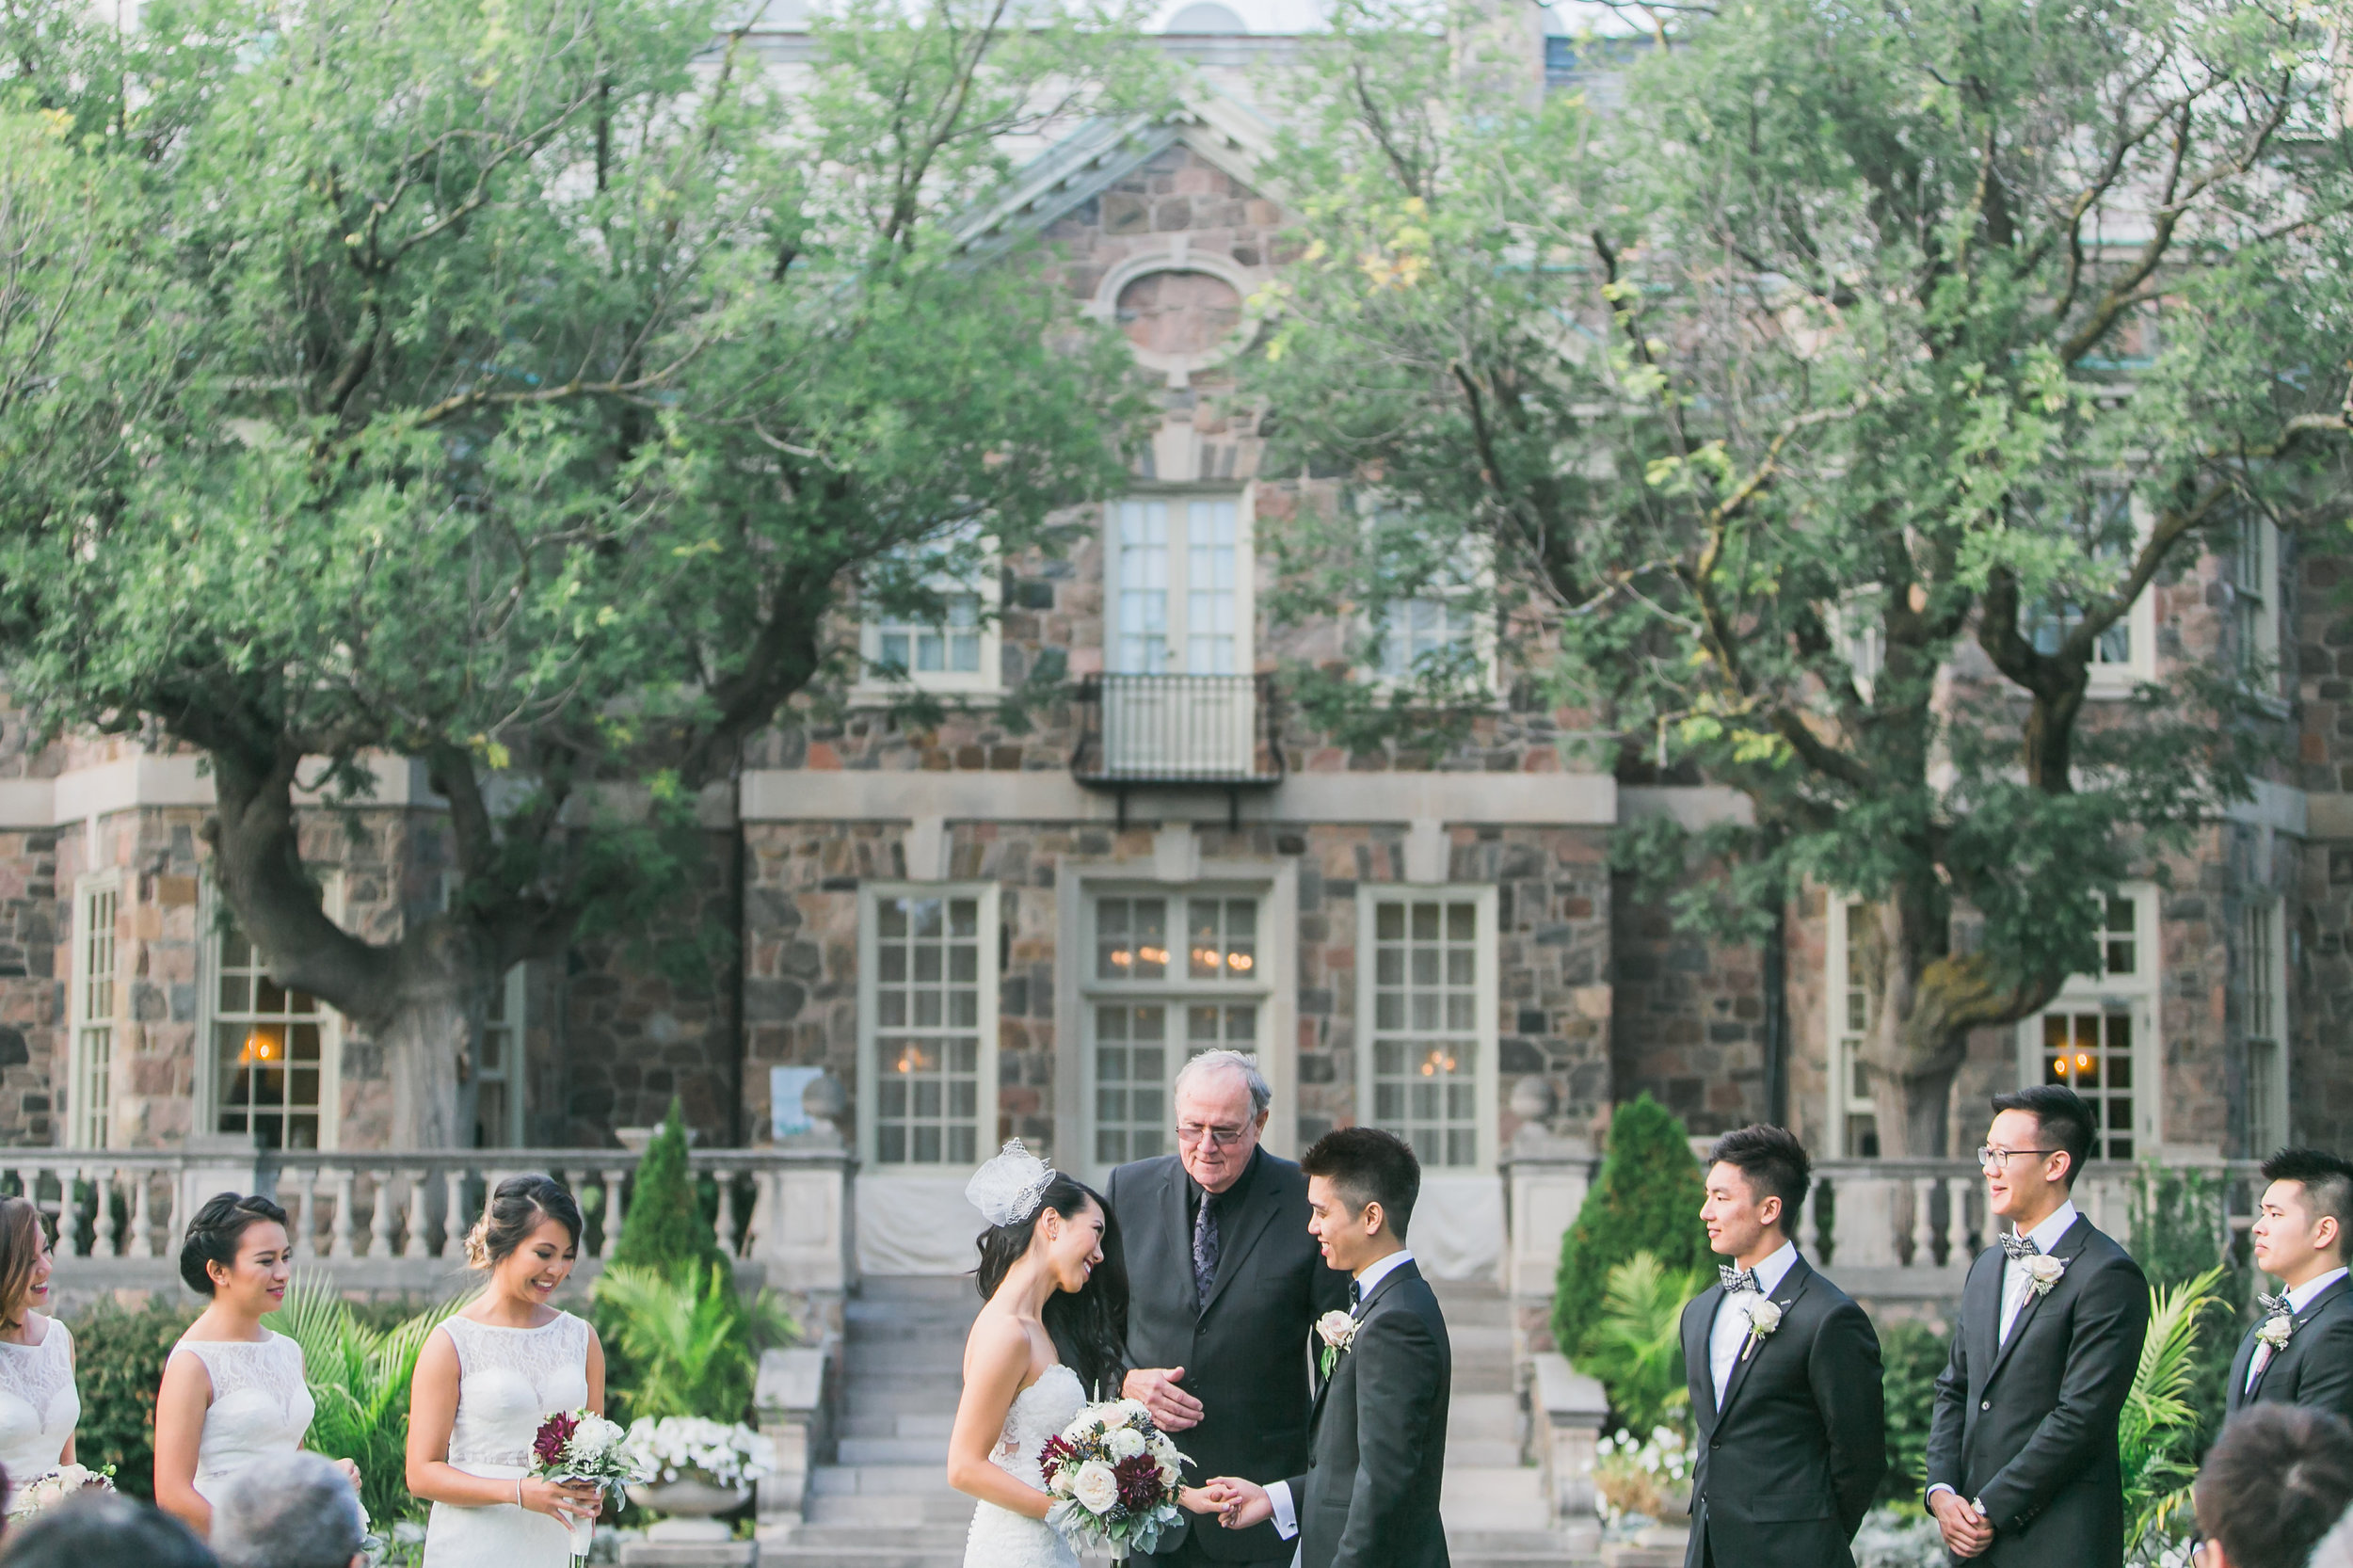 LK-Graydon_Hall_Manor_Wedding_Photos-Rhythm_Photography-0655.jpg